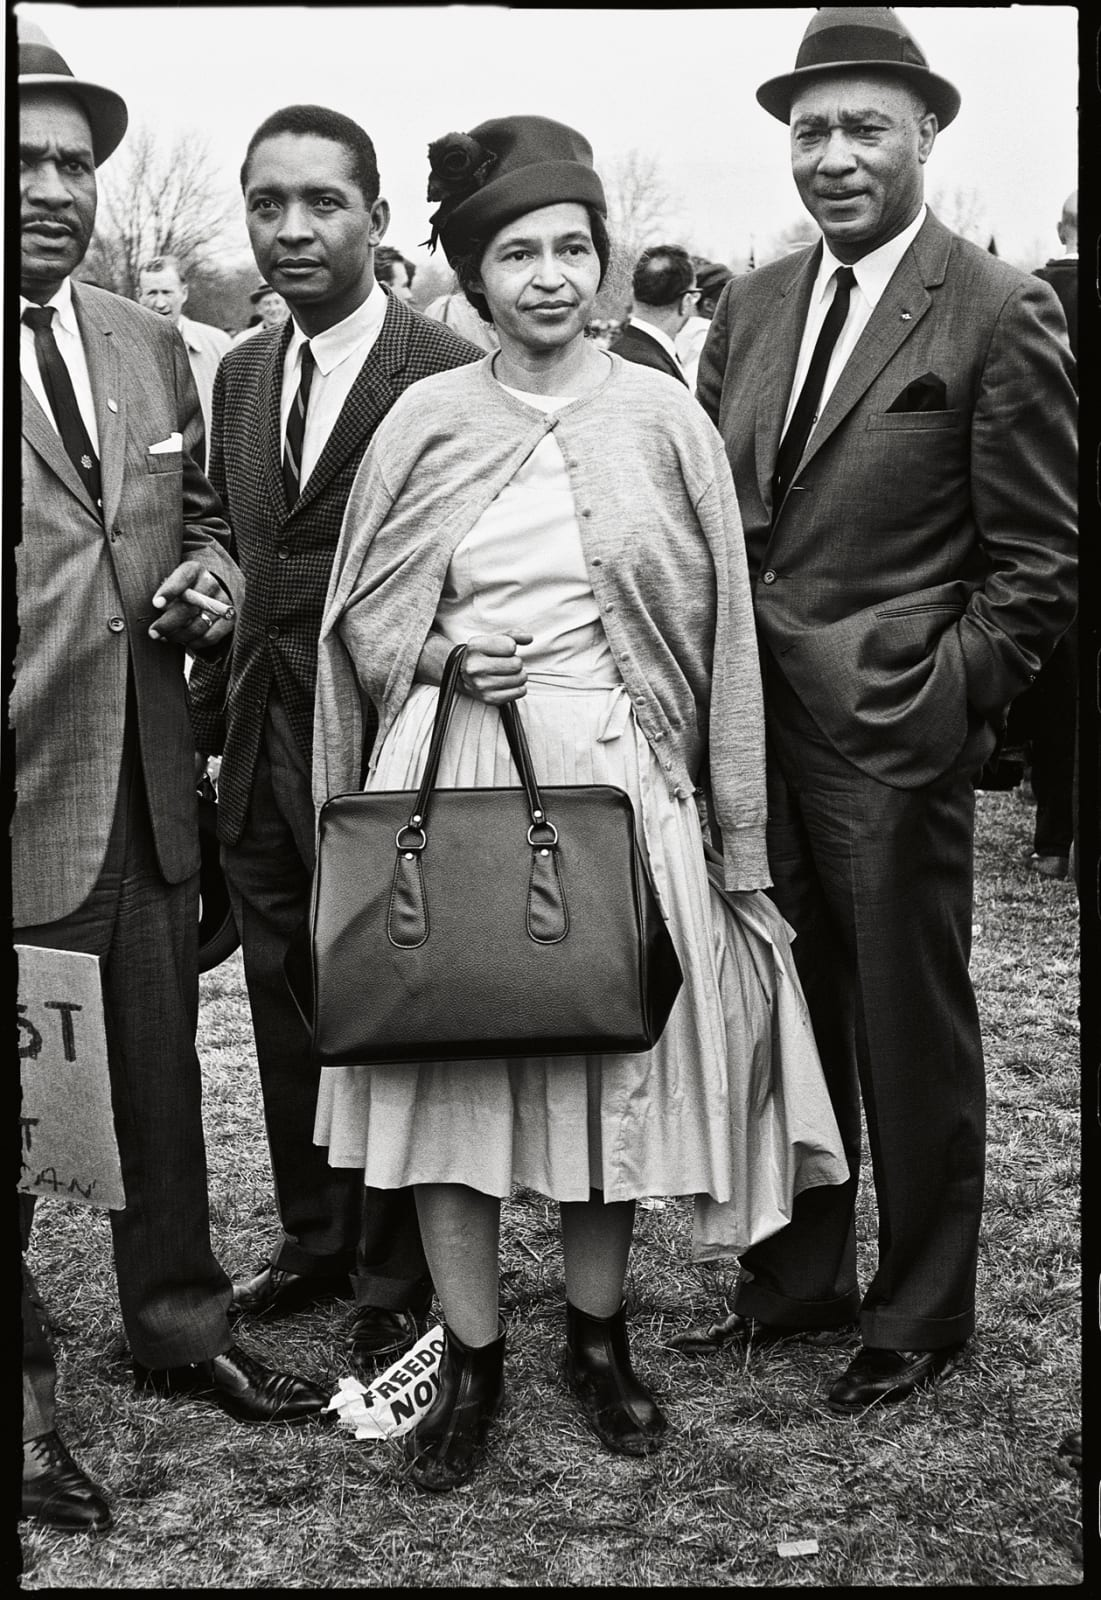 Steve Schapiro Rosa Parks / Selma March, 1965